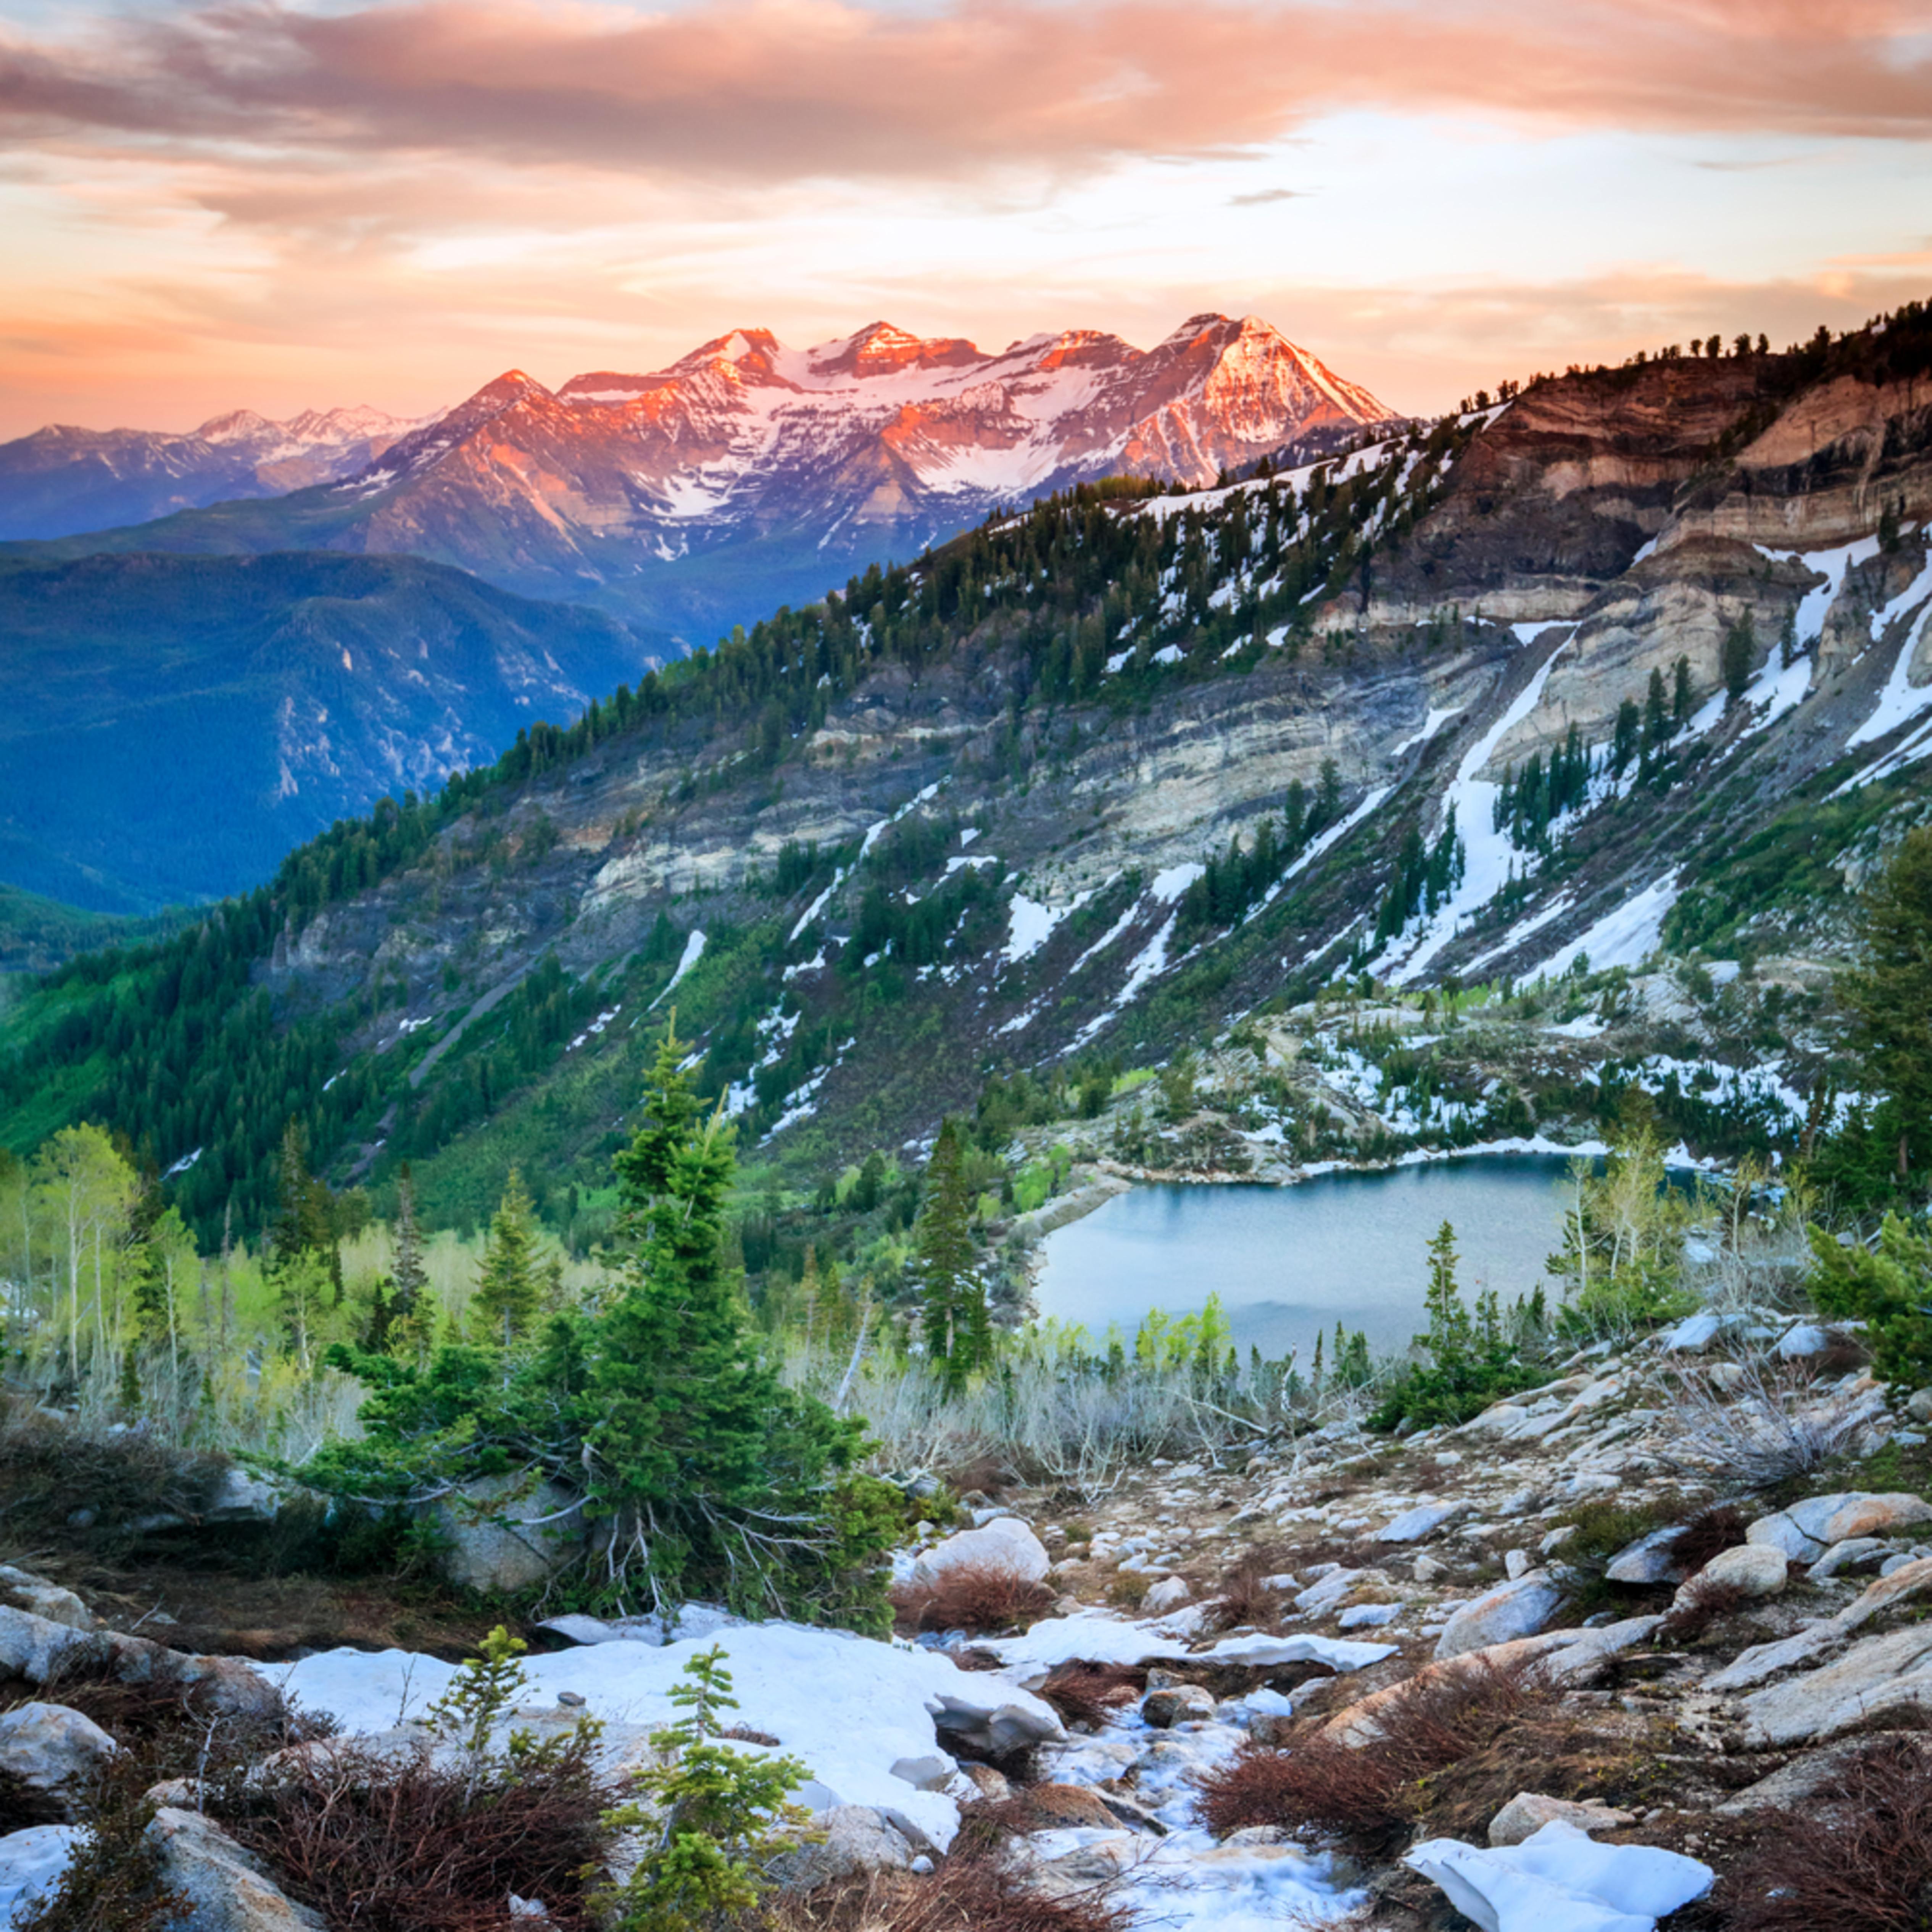 Silver lake snowy stream asf fhf0mn